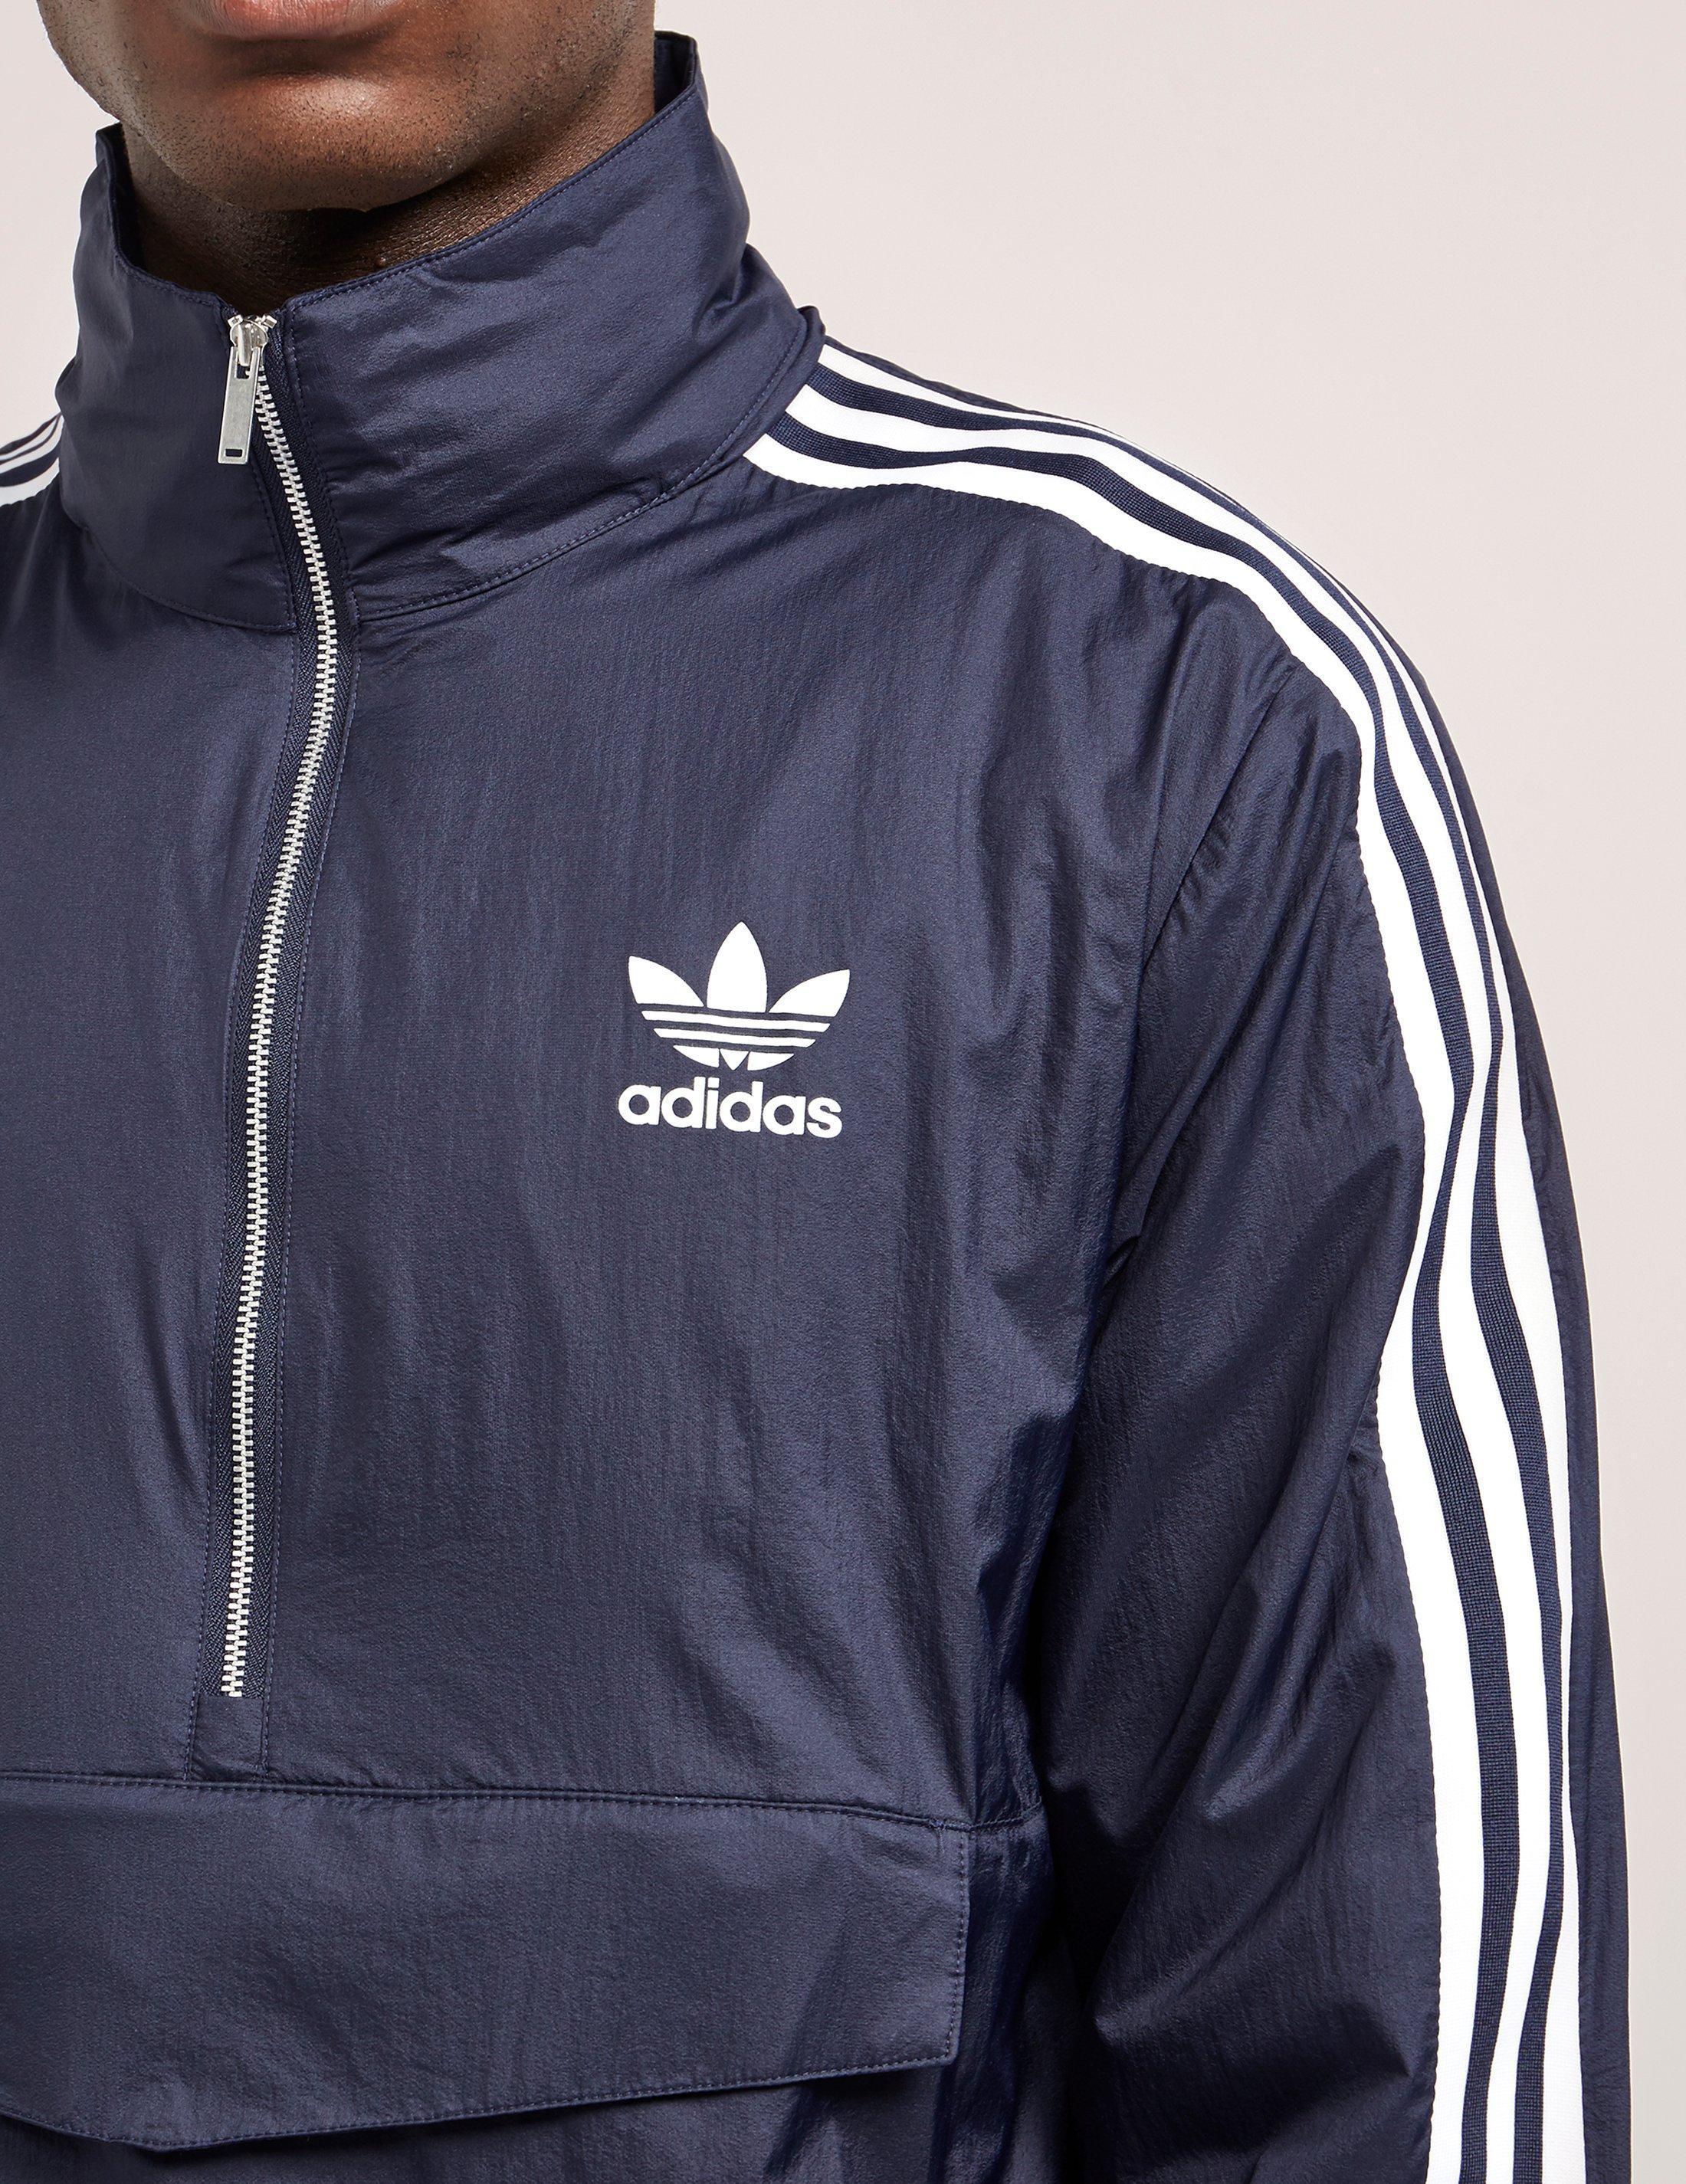 adidas Originals Mens London Half Zip Lightweight Jacket